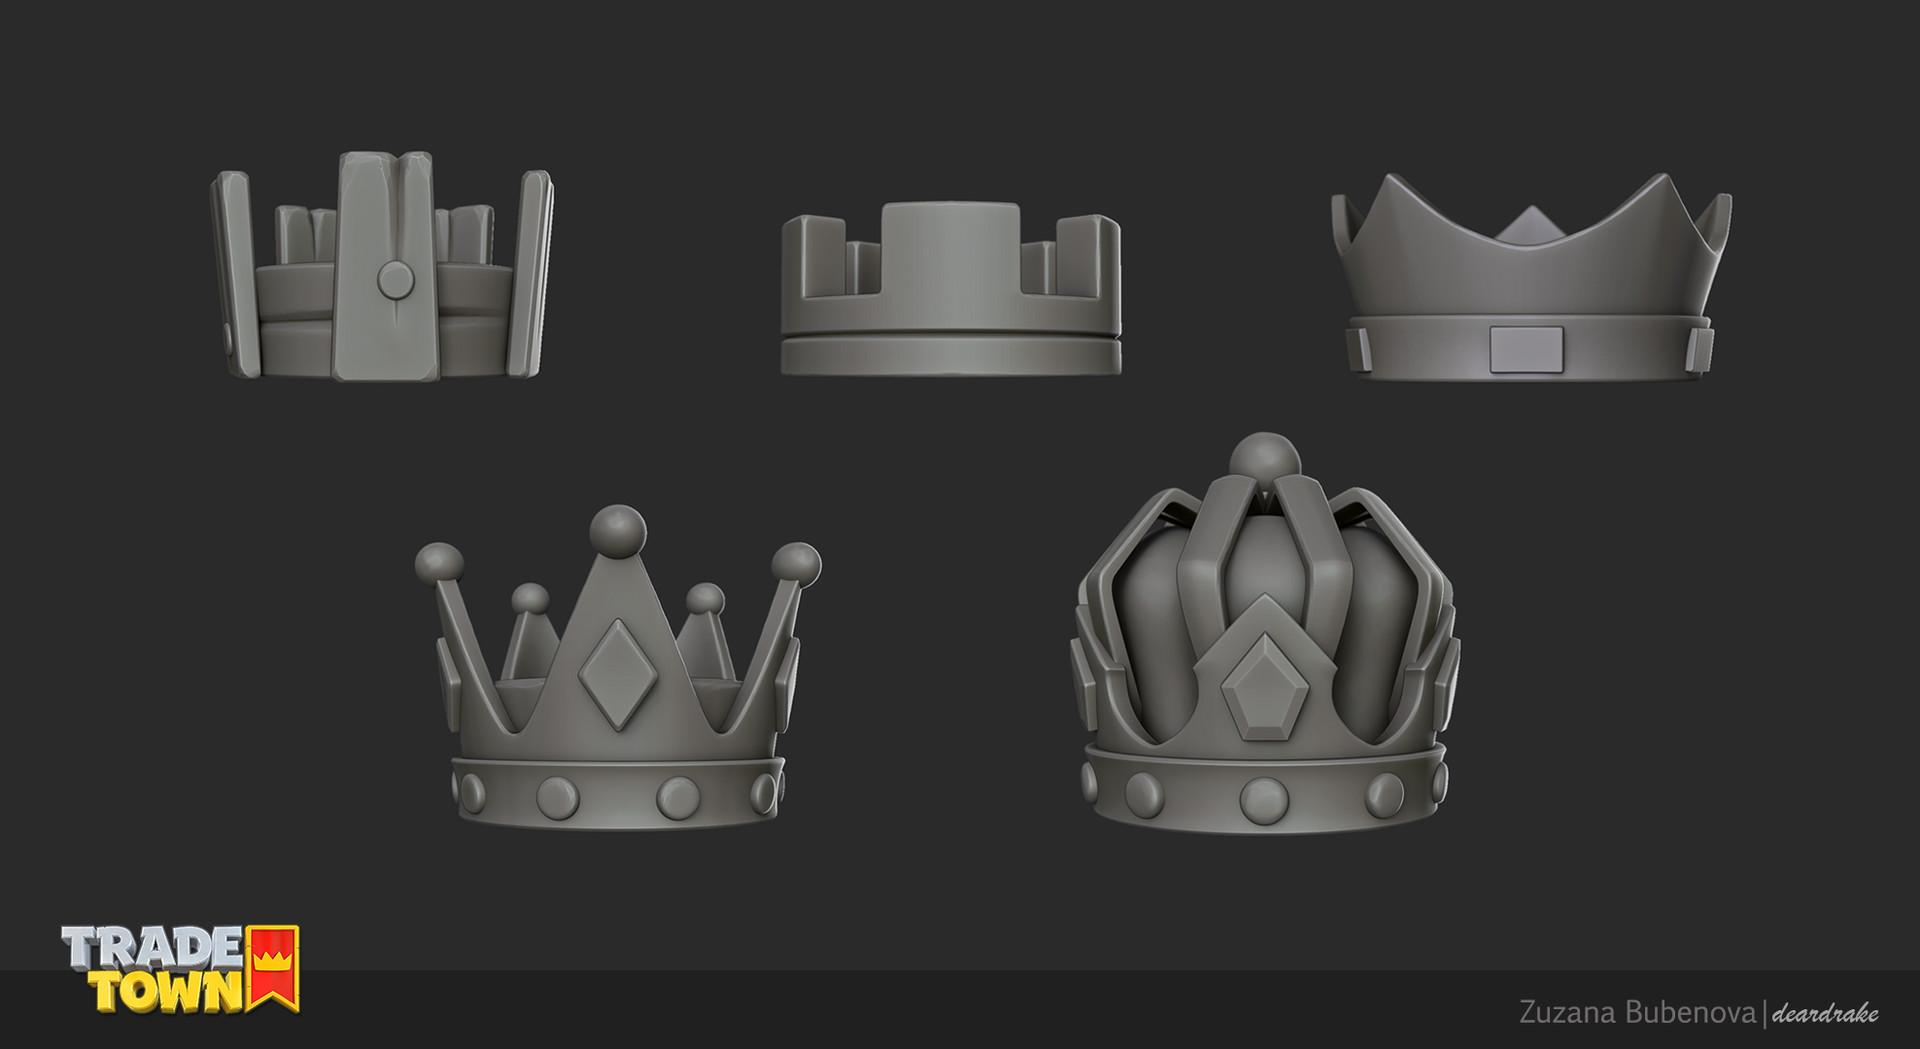 Zuzana bubenova crowns